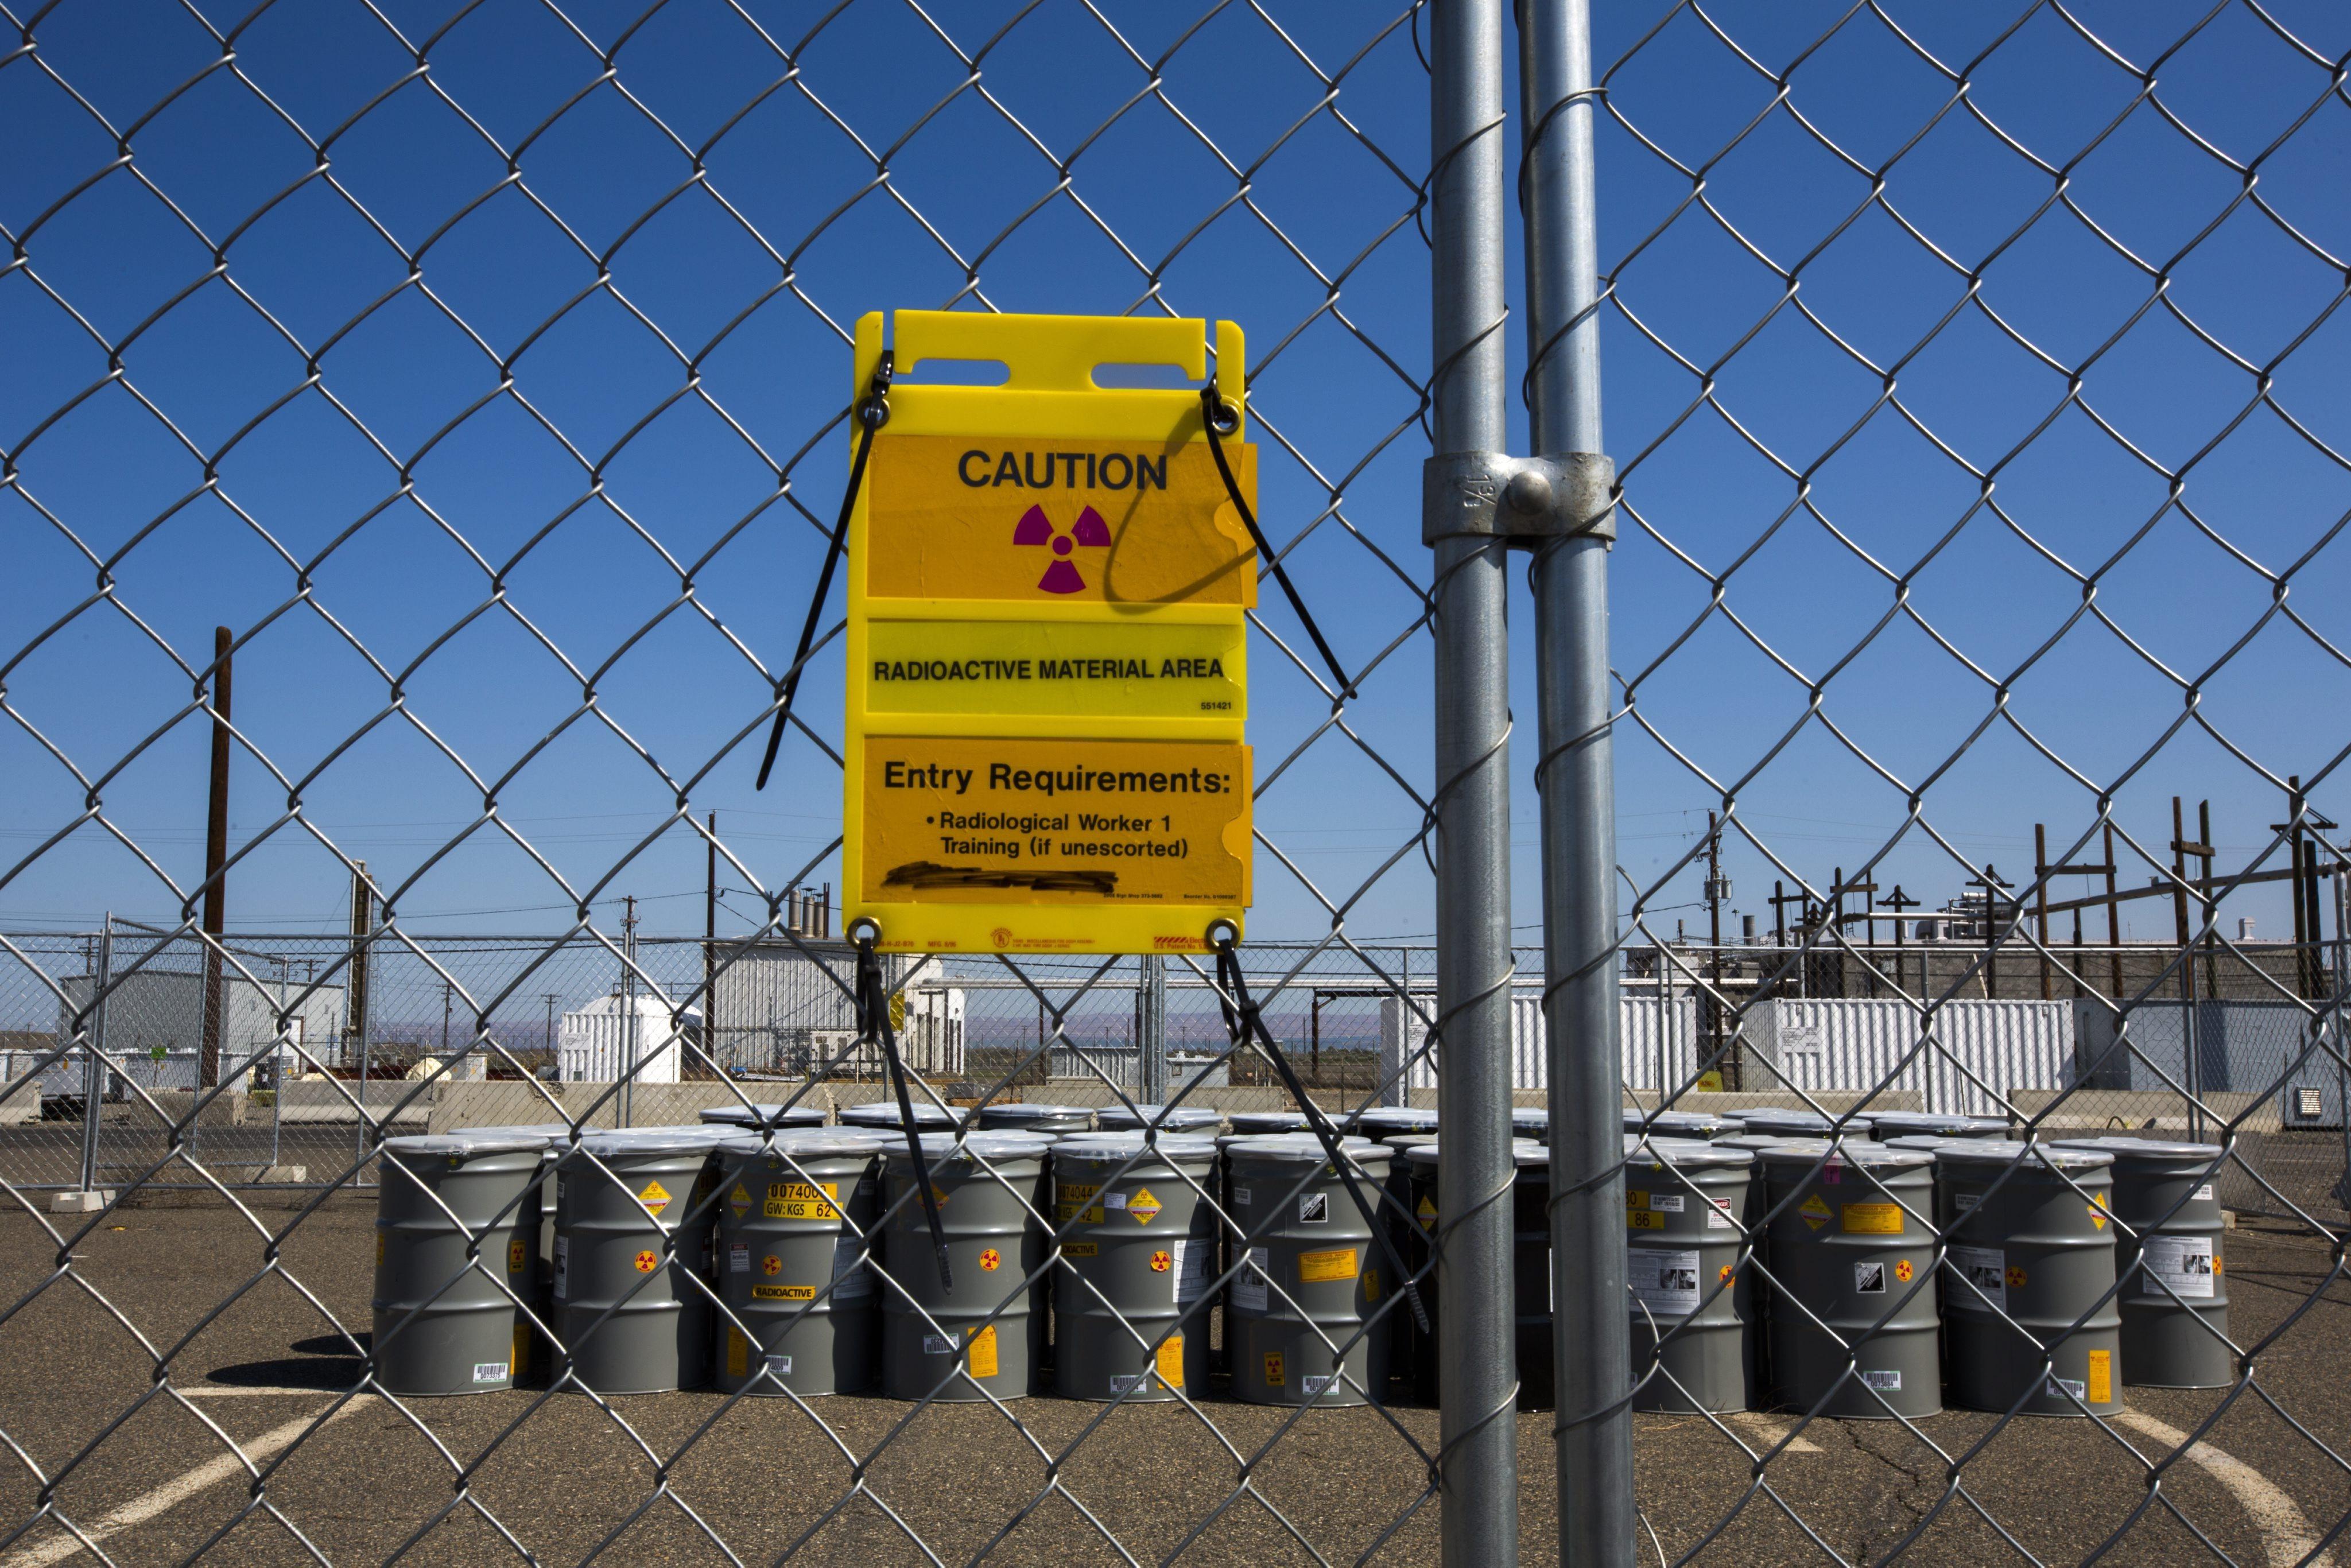 утиутилизация радиоактивных отходовлизация радиоактивных отходов